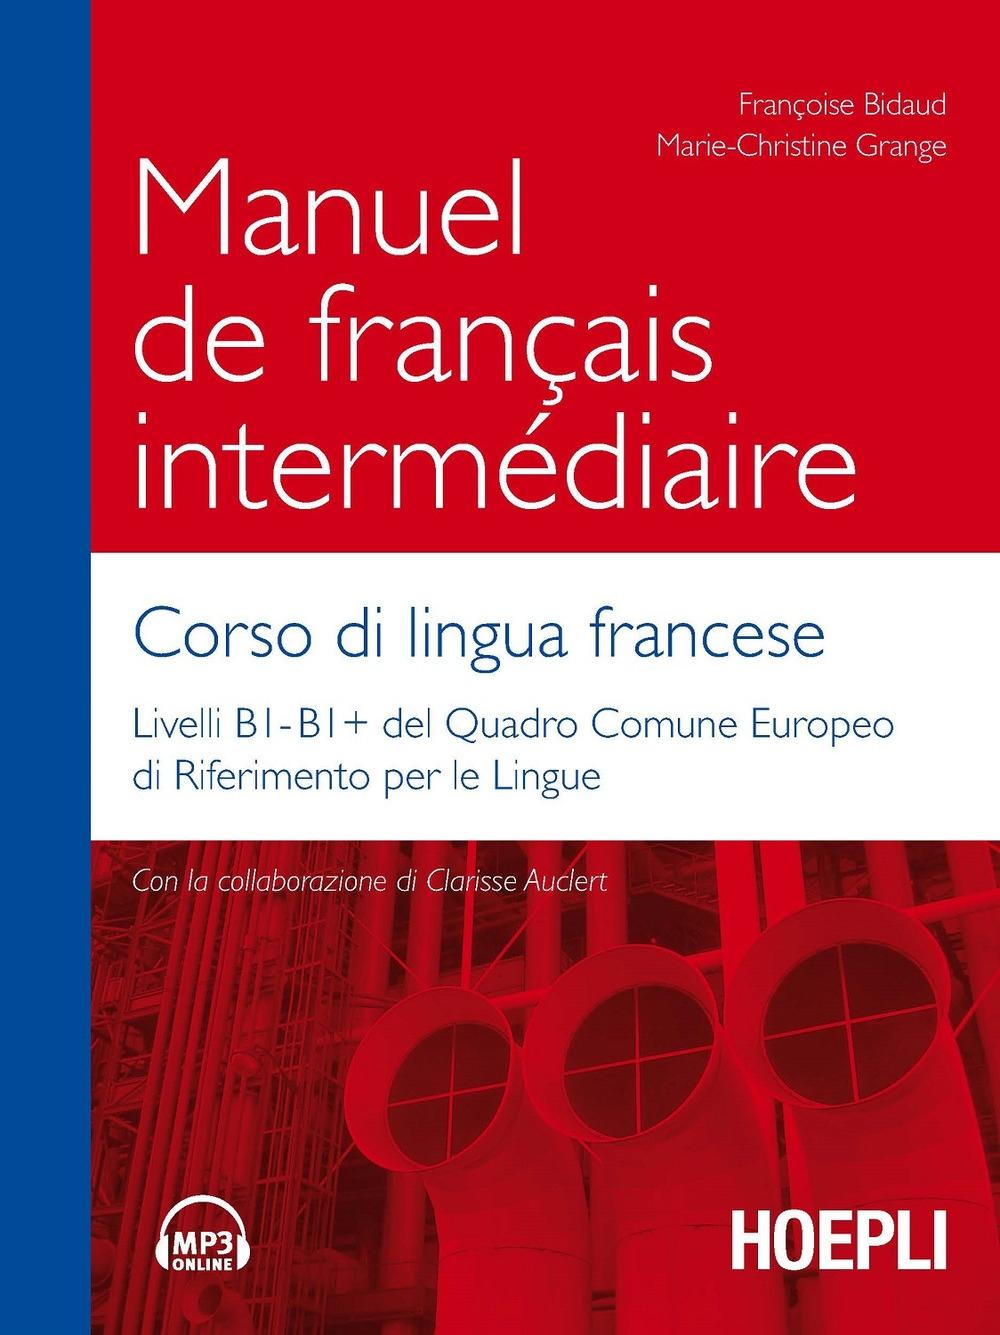 Manuel de français intermédiaire. Corso di lingua francese